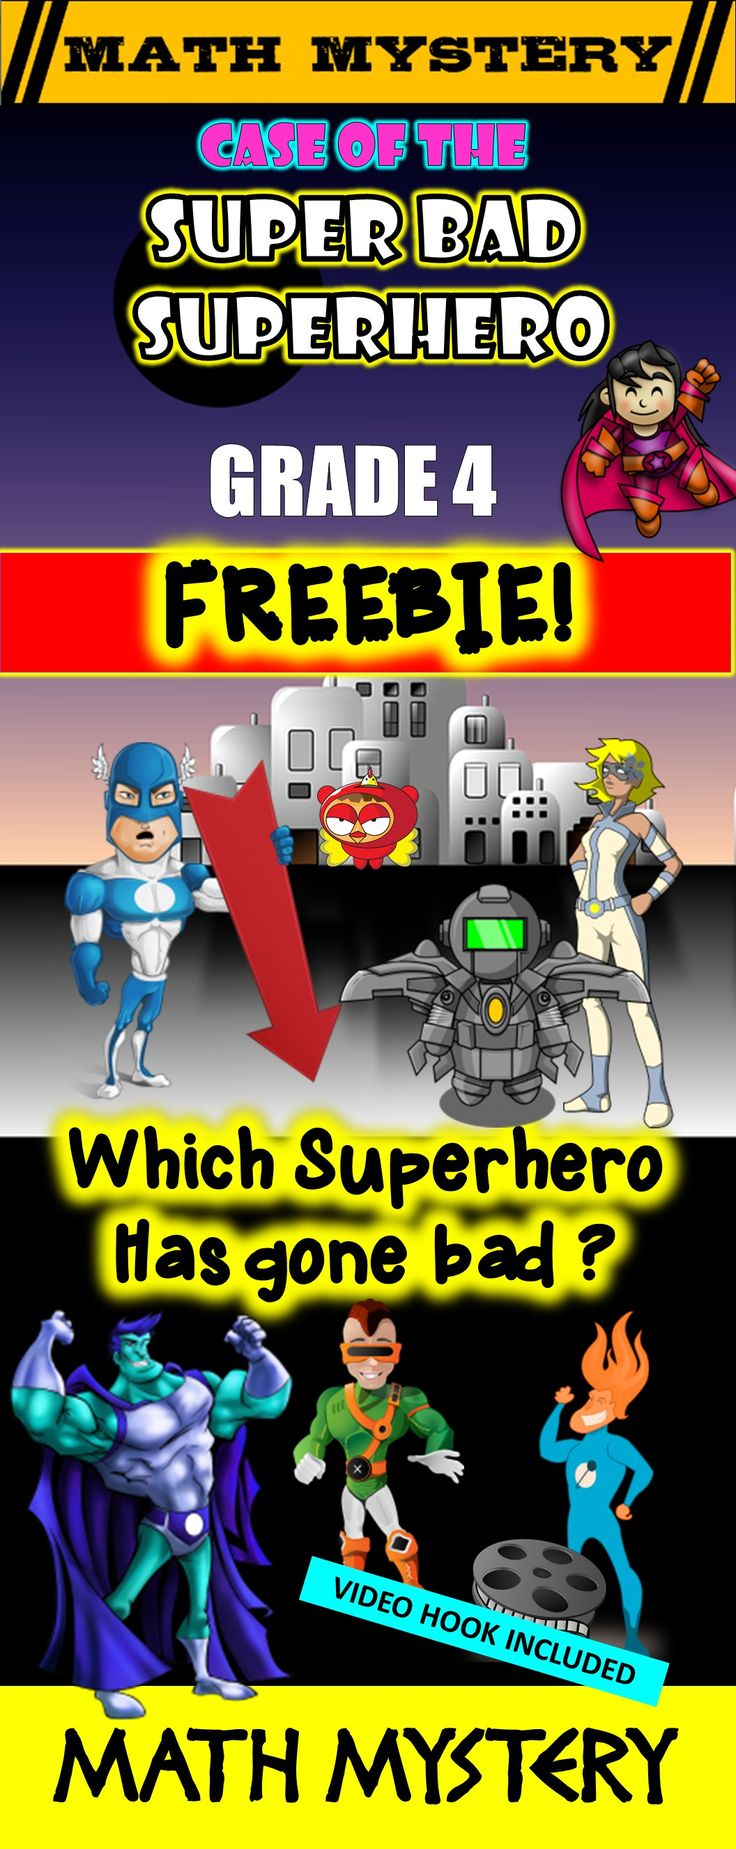 Math Mystery FREEBIE! Case of The Super Bad Superhero! GRADE 4 Version. Fun math review activity!